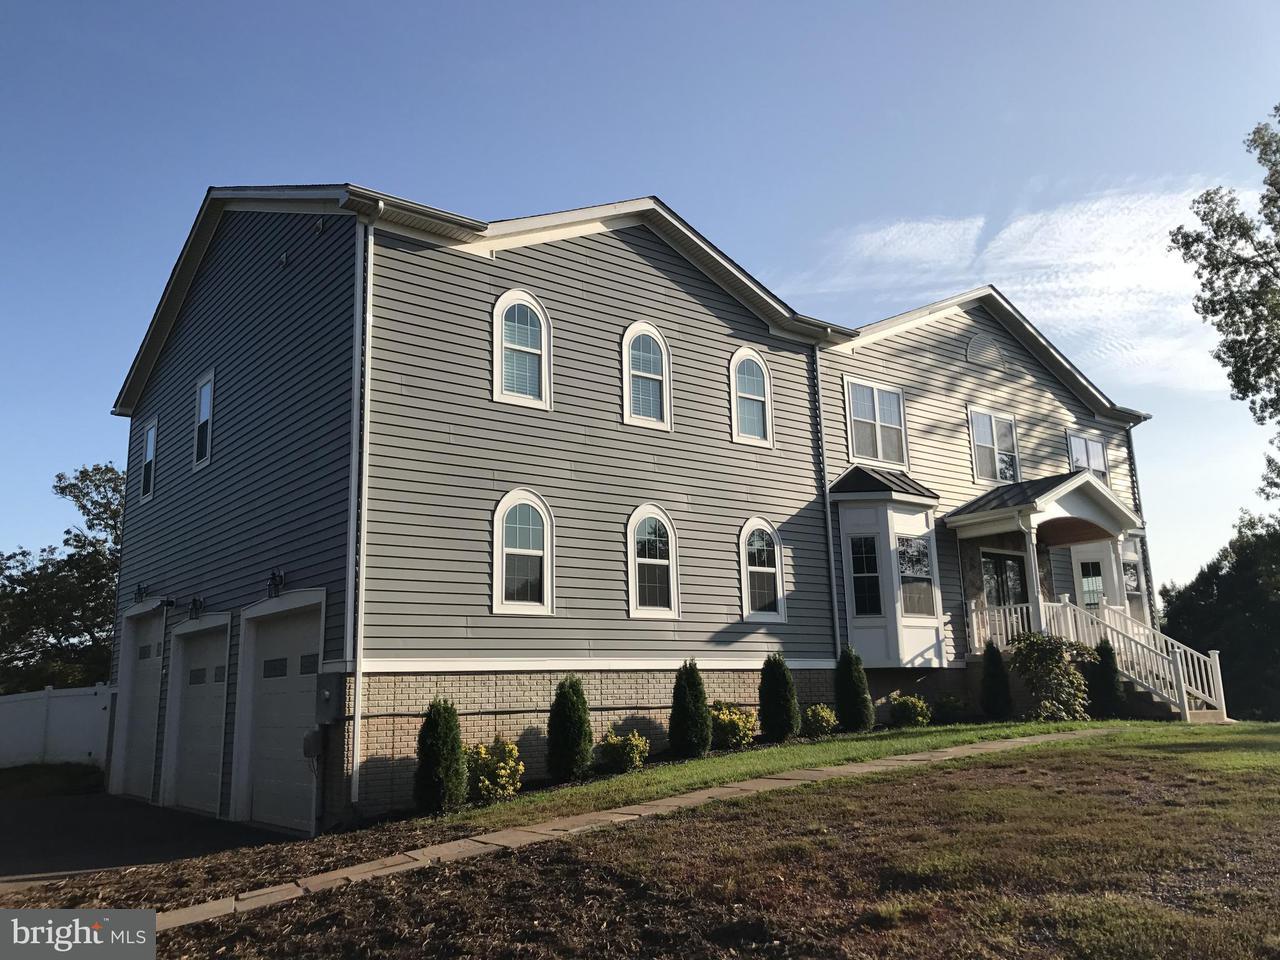 Single Family Home for Sale at 9317 BRENTSVILLE Road 9317 BRENTSVILLE Road Manassas, Virginia 20112 United States